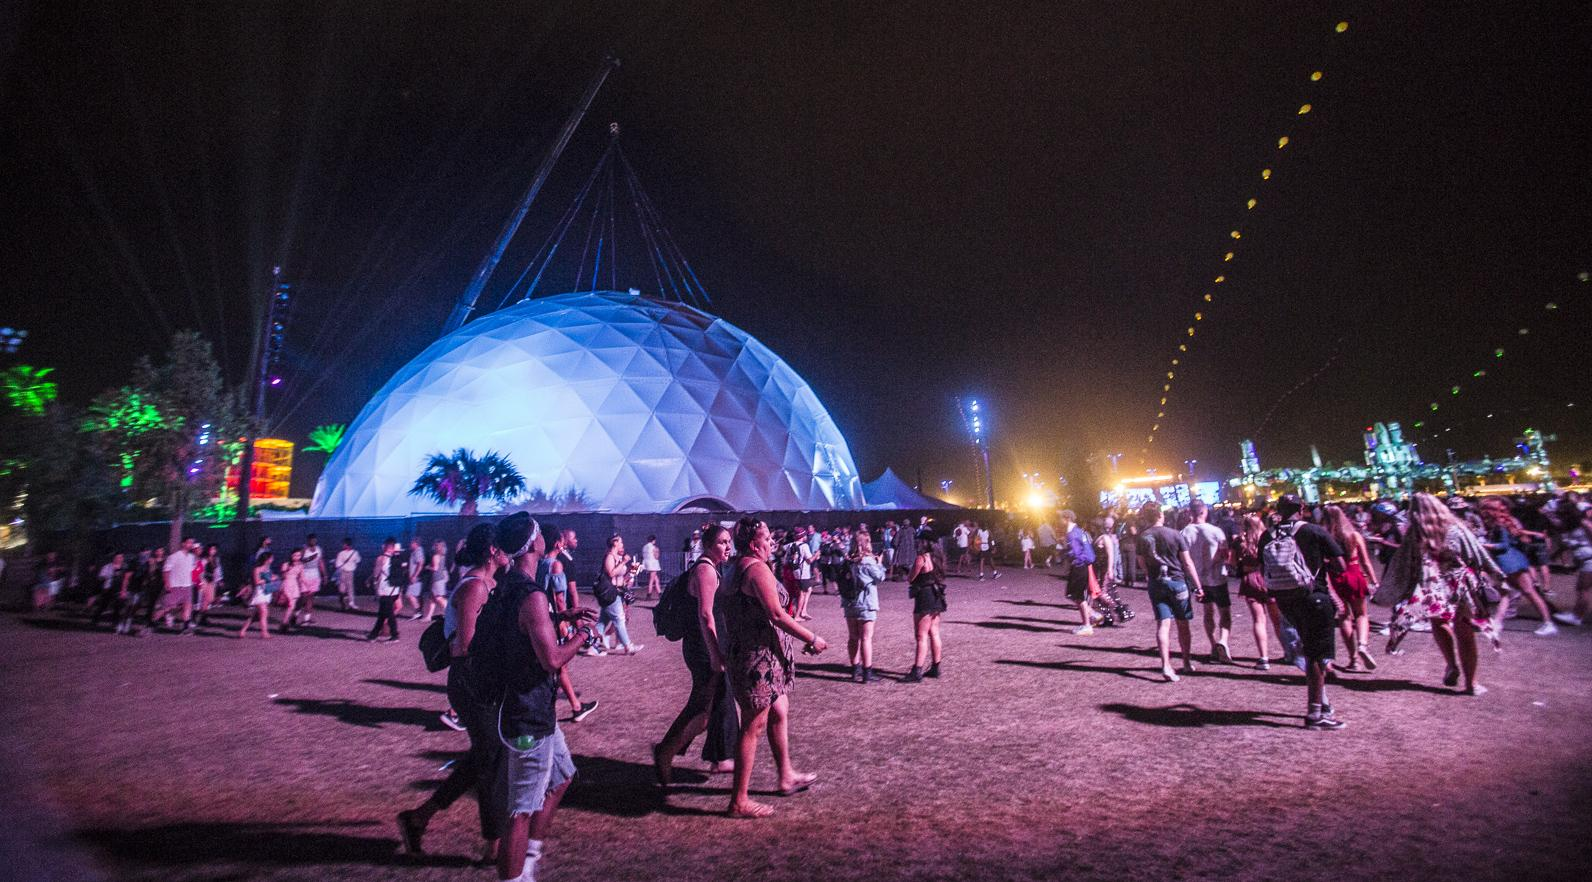 The Antarctic Dome at Coachella